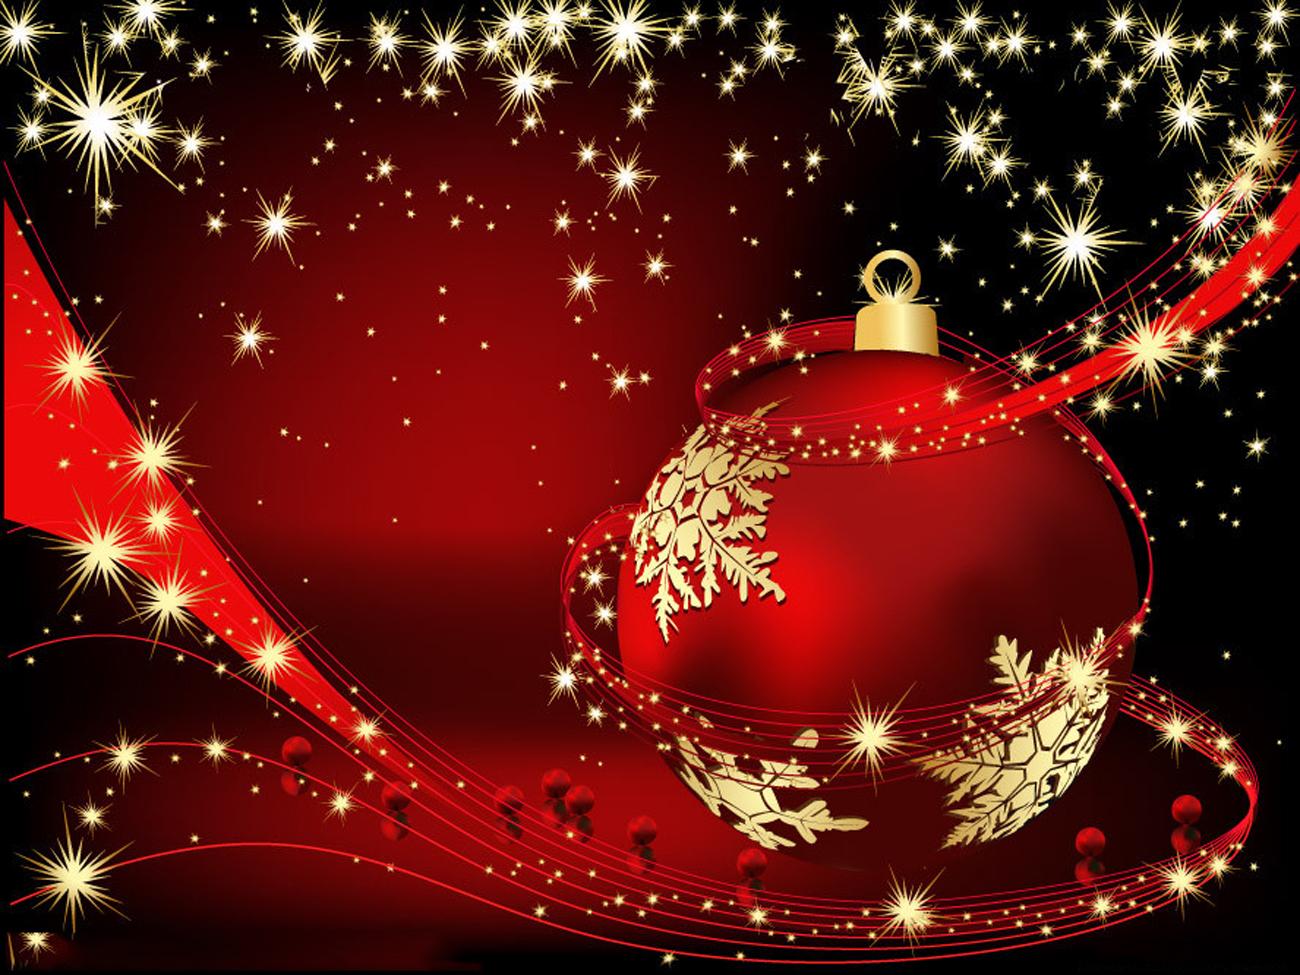 Christmas Holiday Wallpaper   Clip Art Library 1300x975